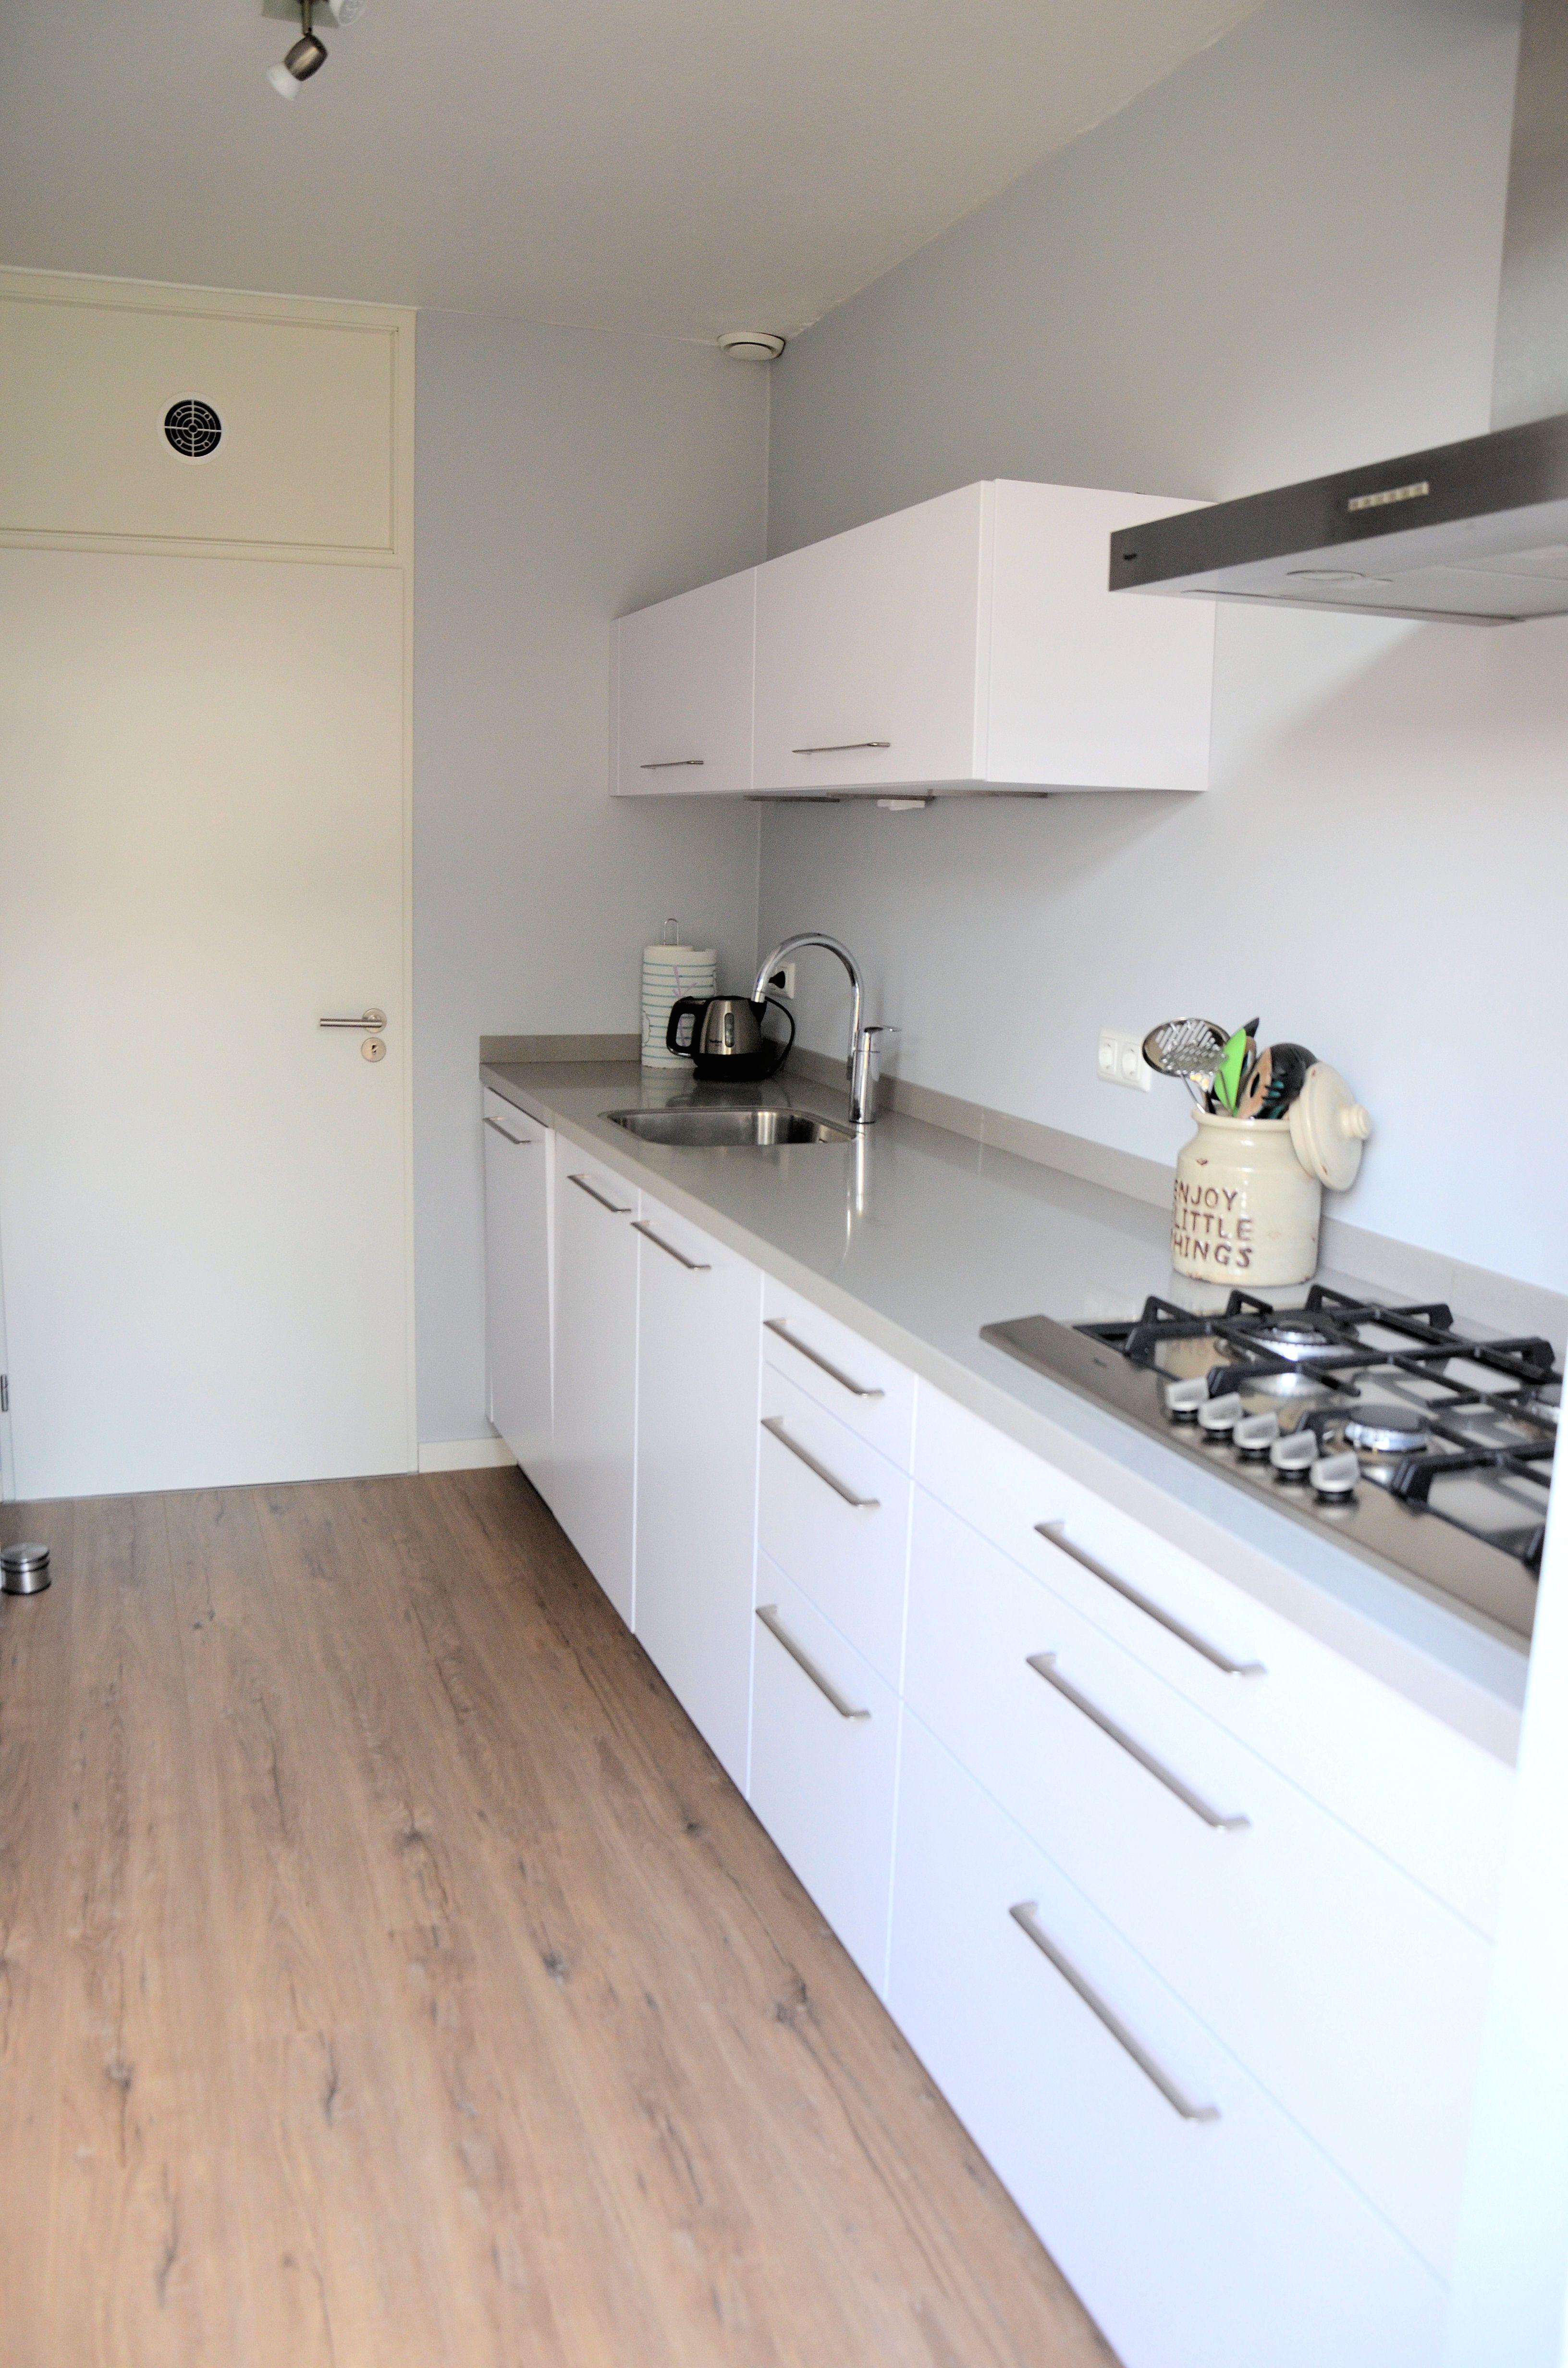 Moderne keuken - Wit - Hoogglans - Modern - Strak ingericht ...